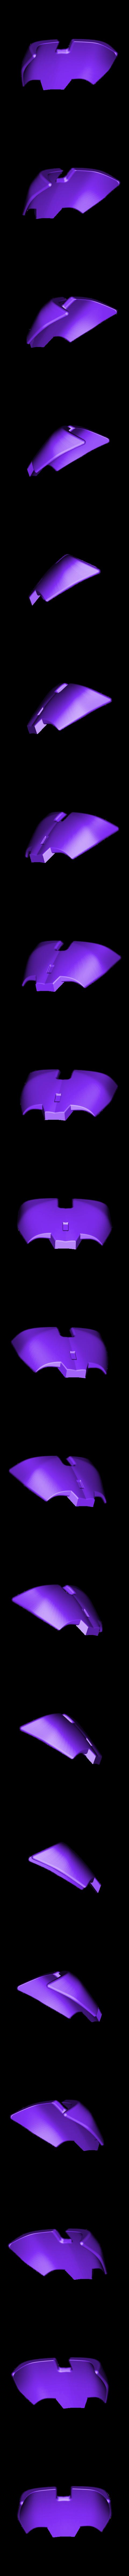 Assem stand test - 0 assem colony transporter-1 29 rear flaps cover -1.STL Download free STL file Colony Transporter model kit 1:72 • 3D printable template, 77LEE77